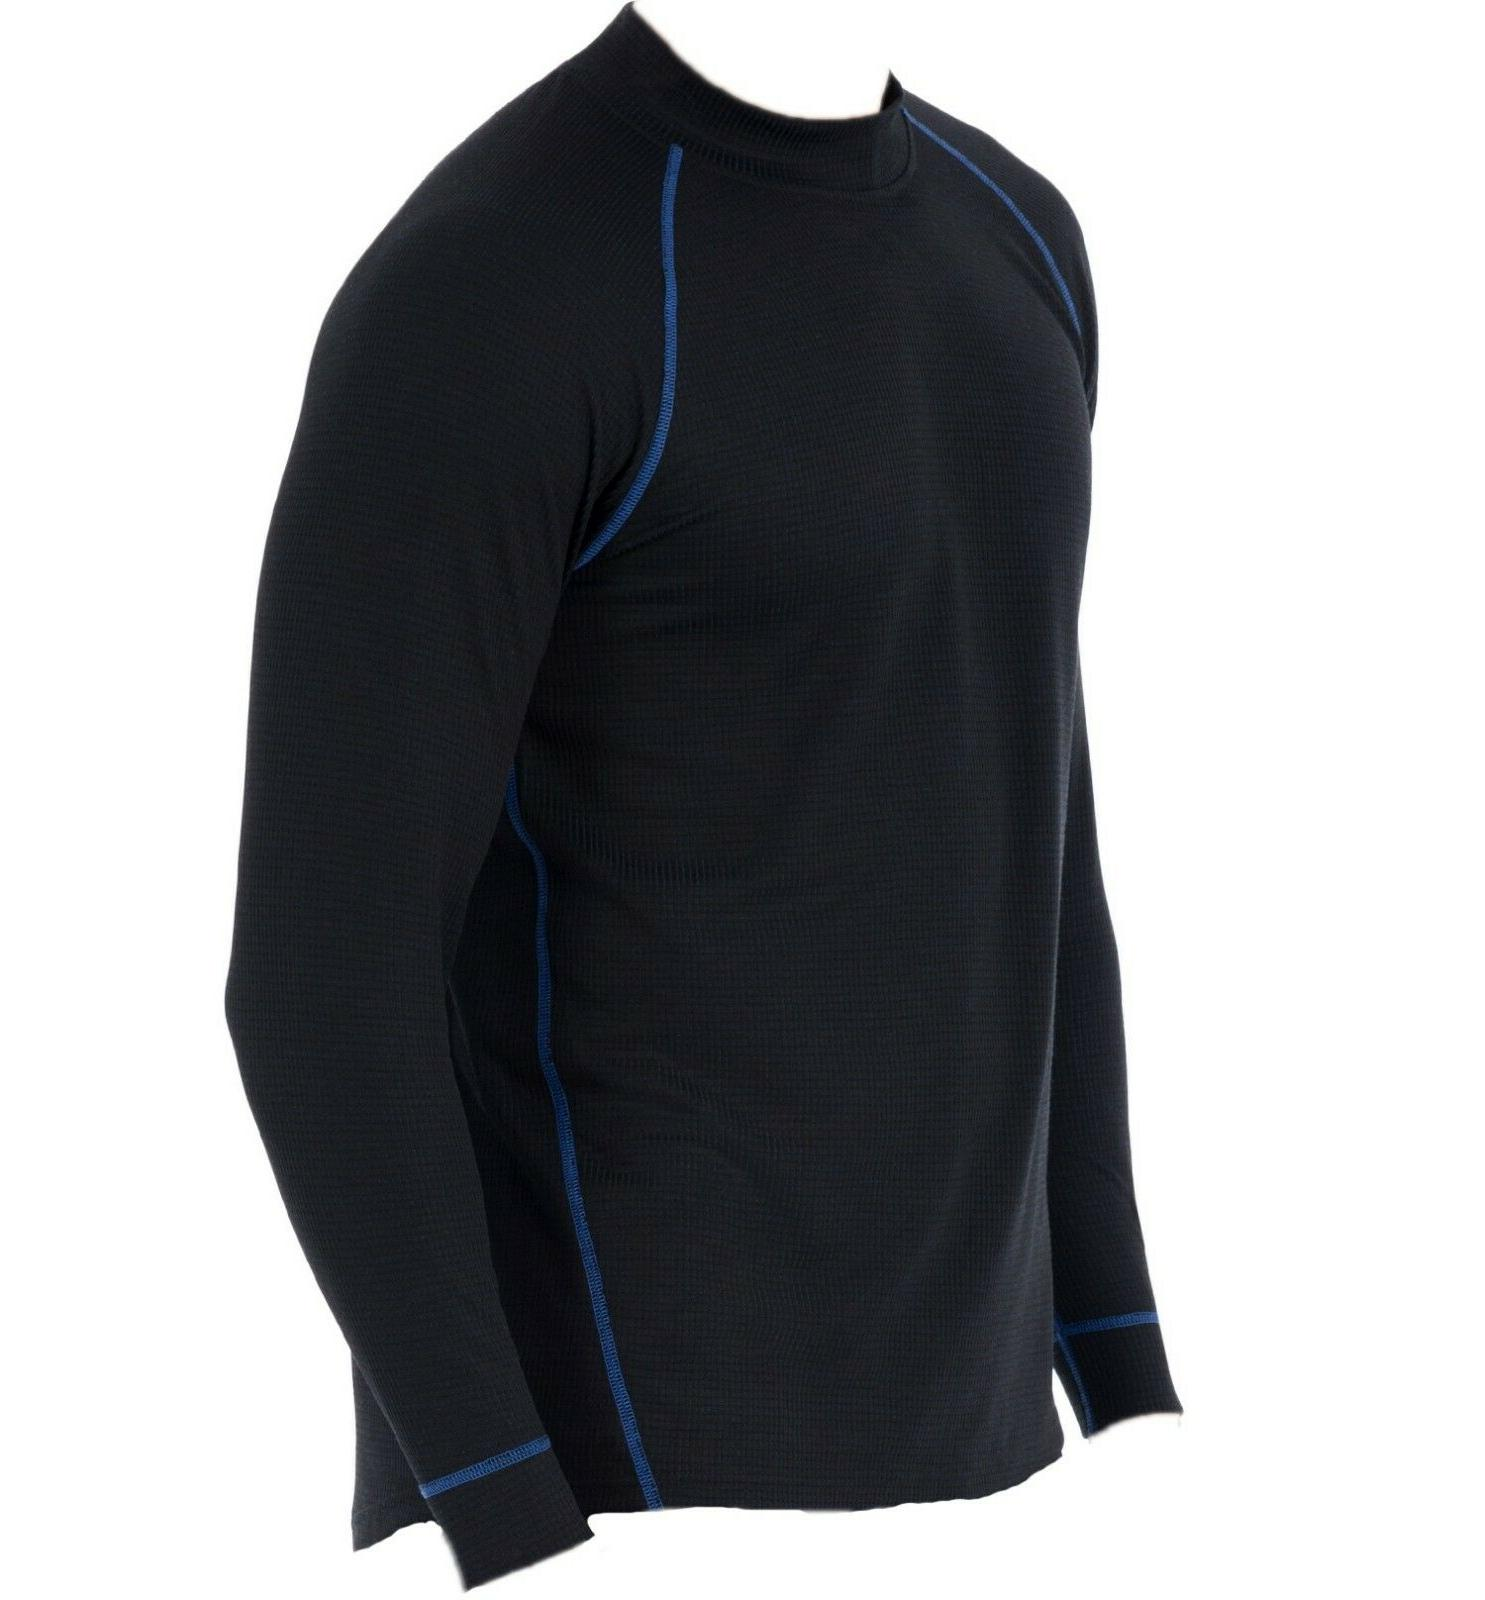 Thermal Shirt Performance Crew Baselayer L3